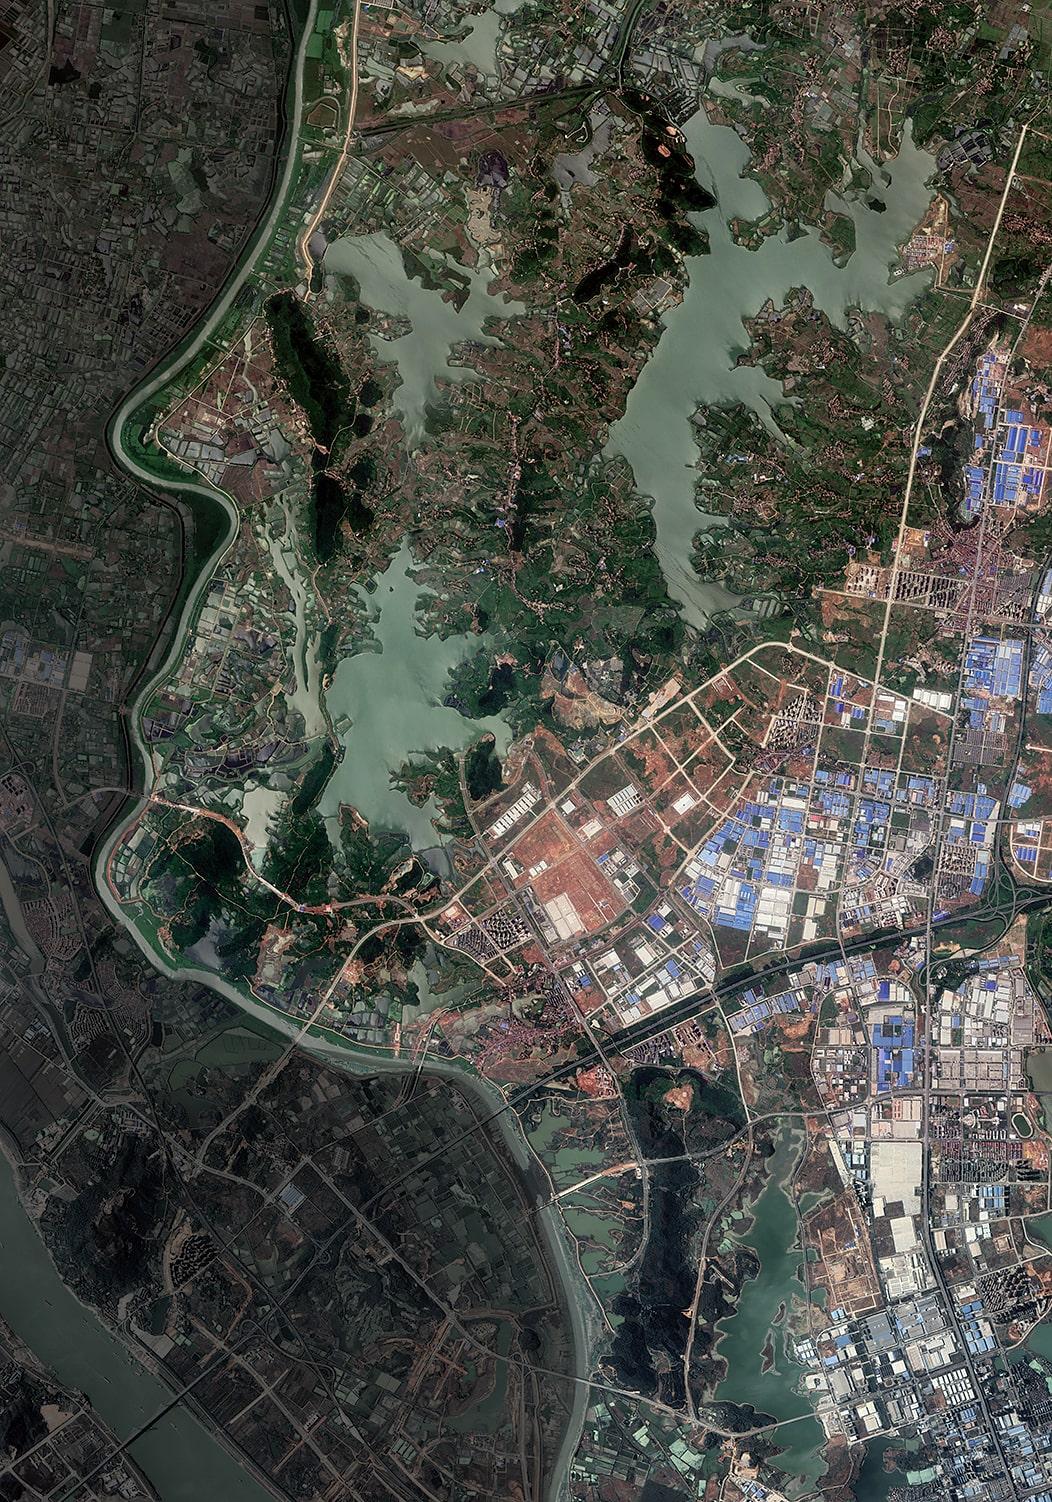 Human's City 9 Wuhan China, 2020, cm 150×105, 1:9